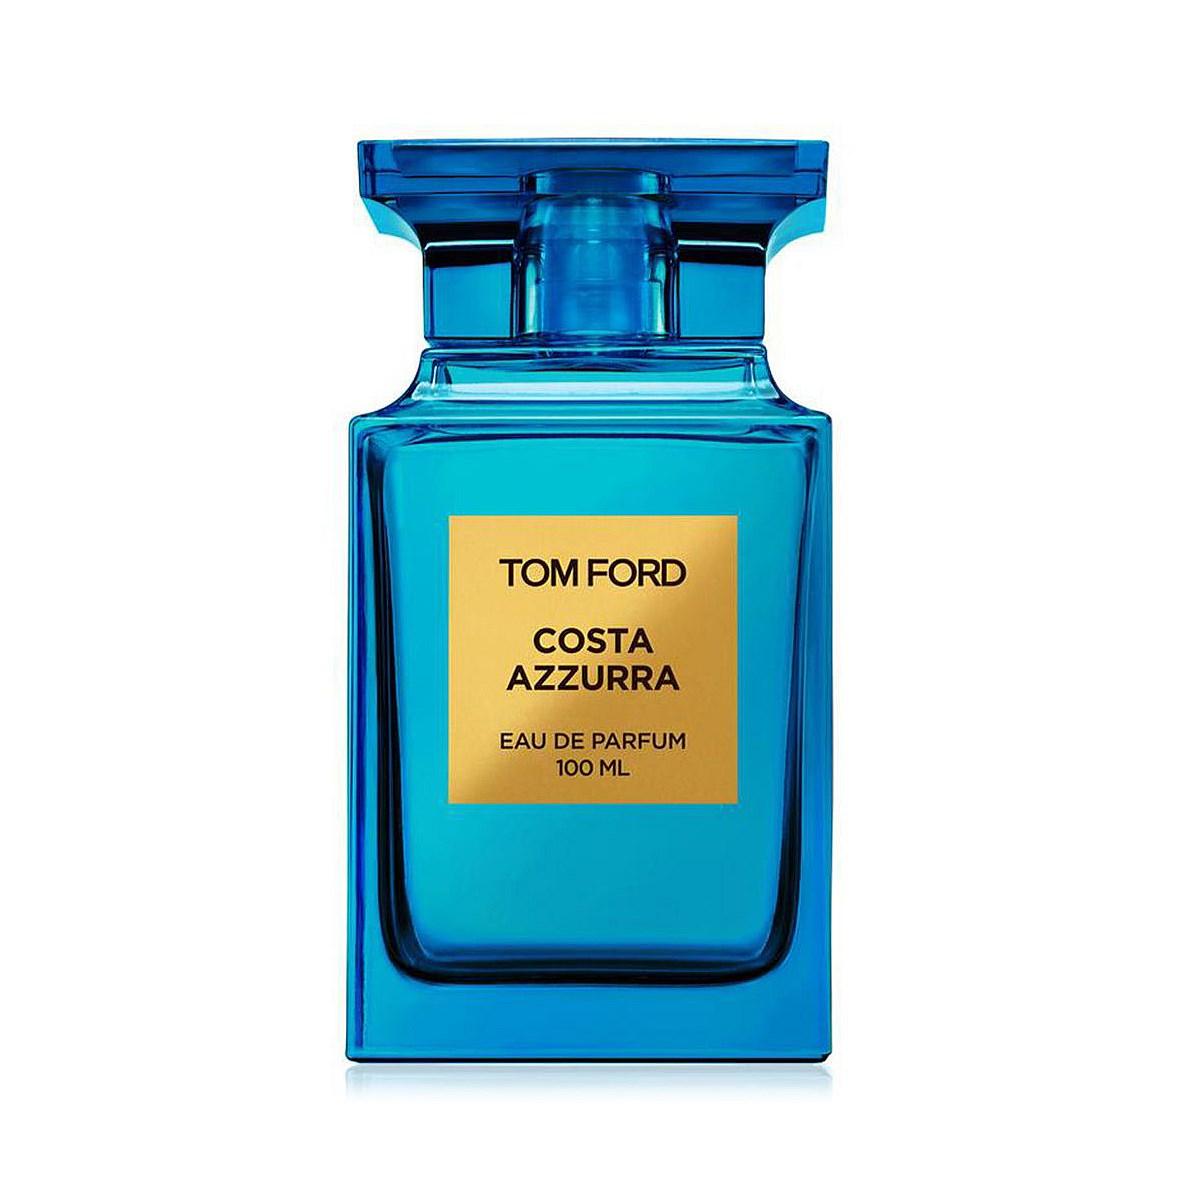 ba776f54e22f Costa Azzurra by Tom Ford Eau De Parfum